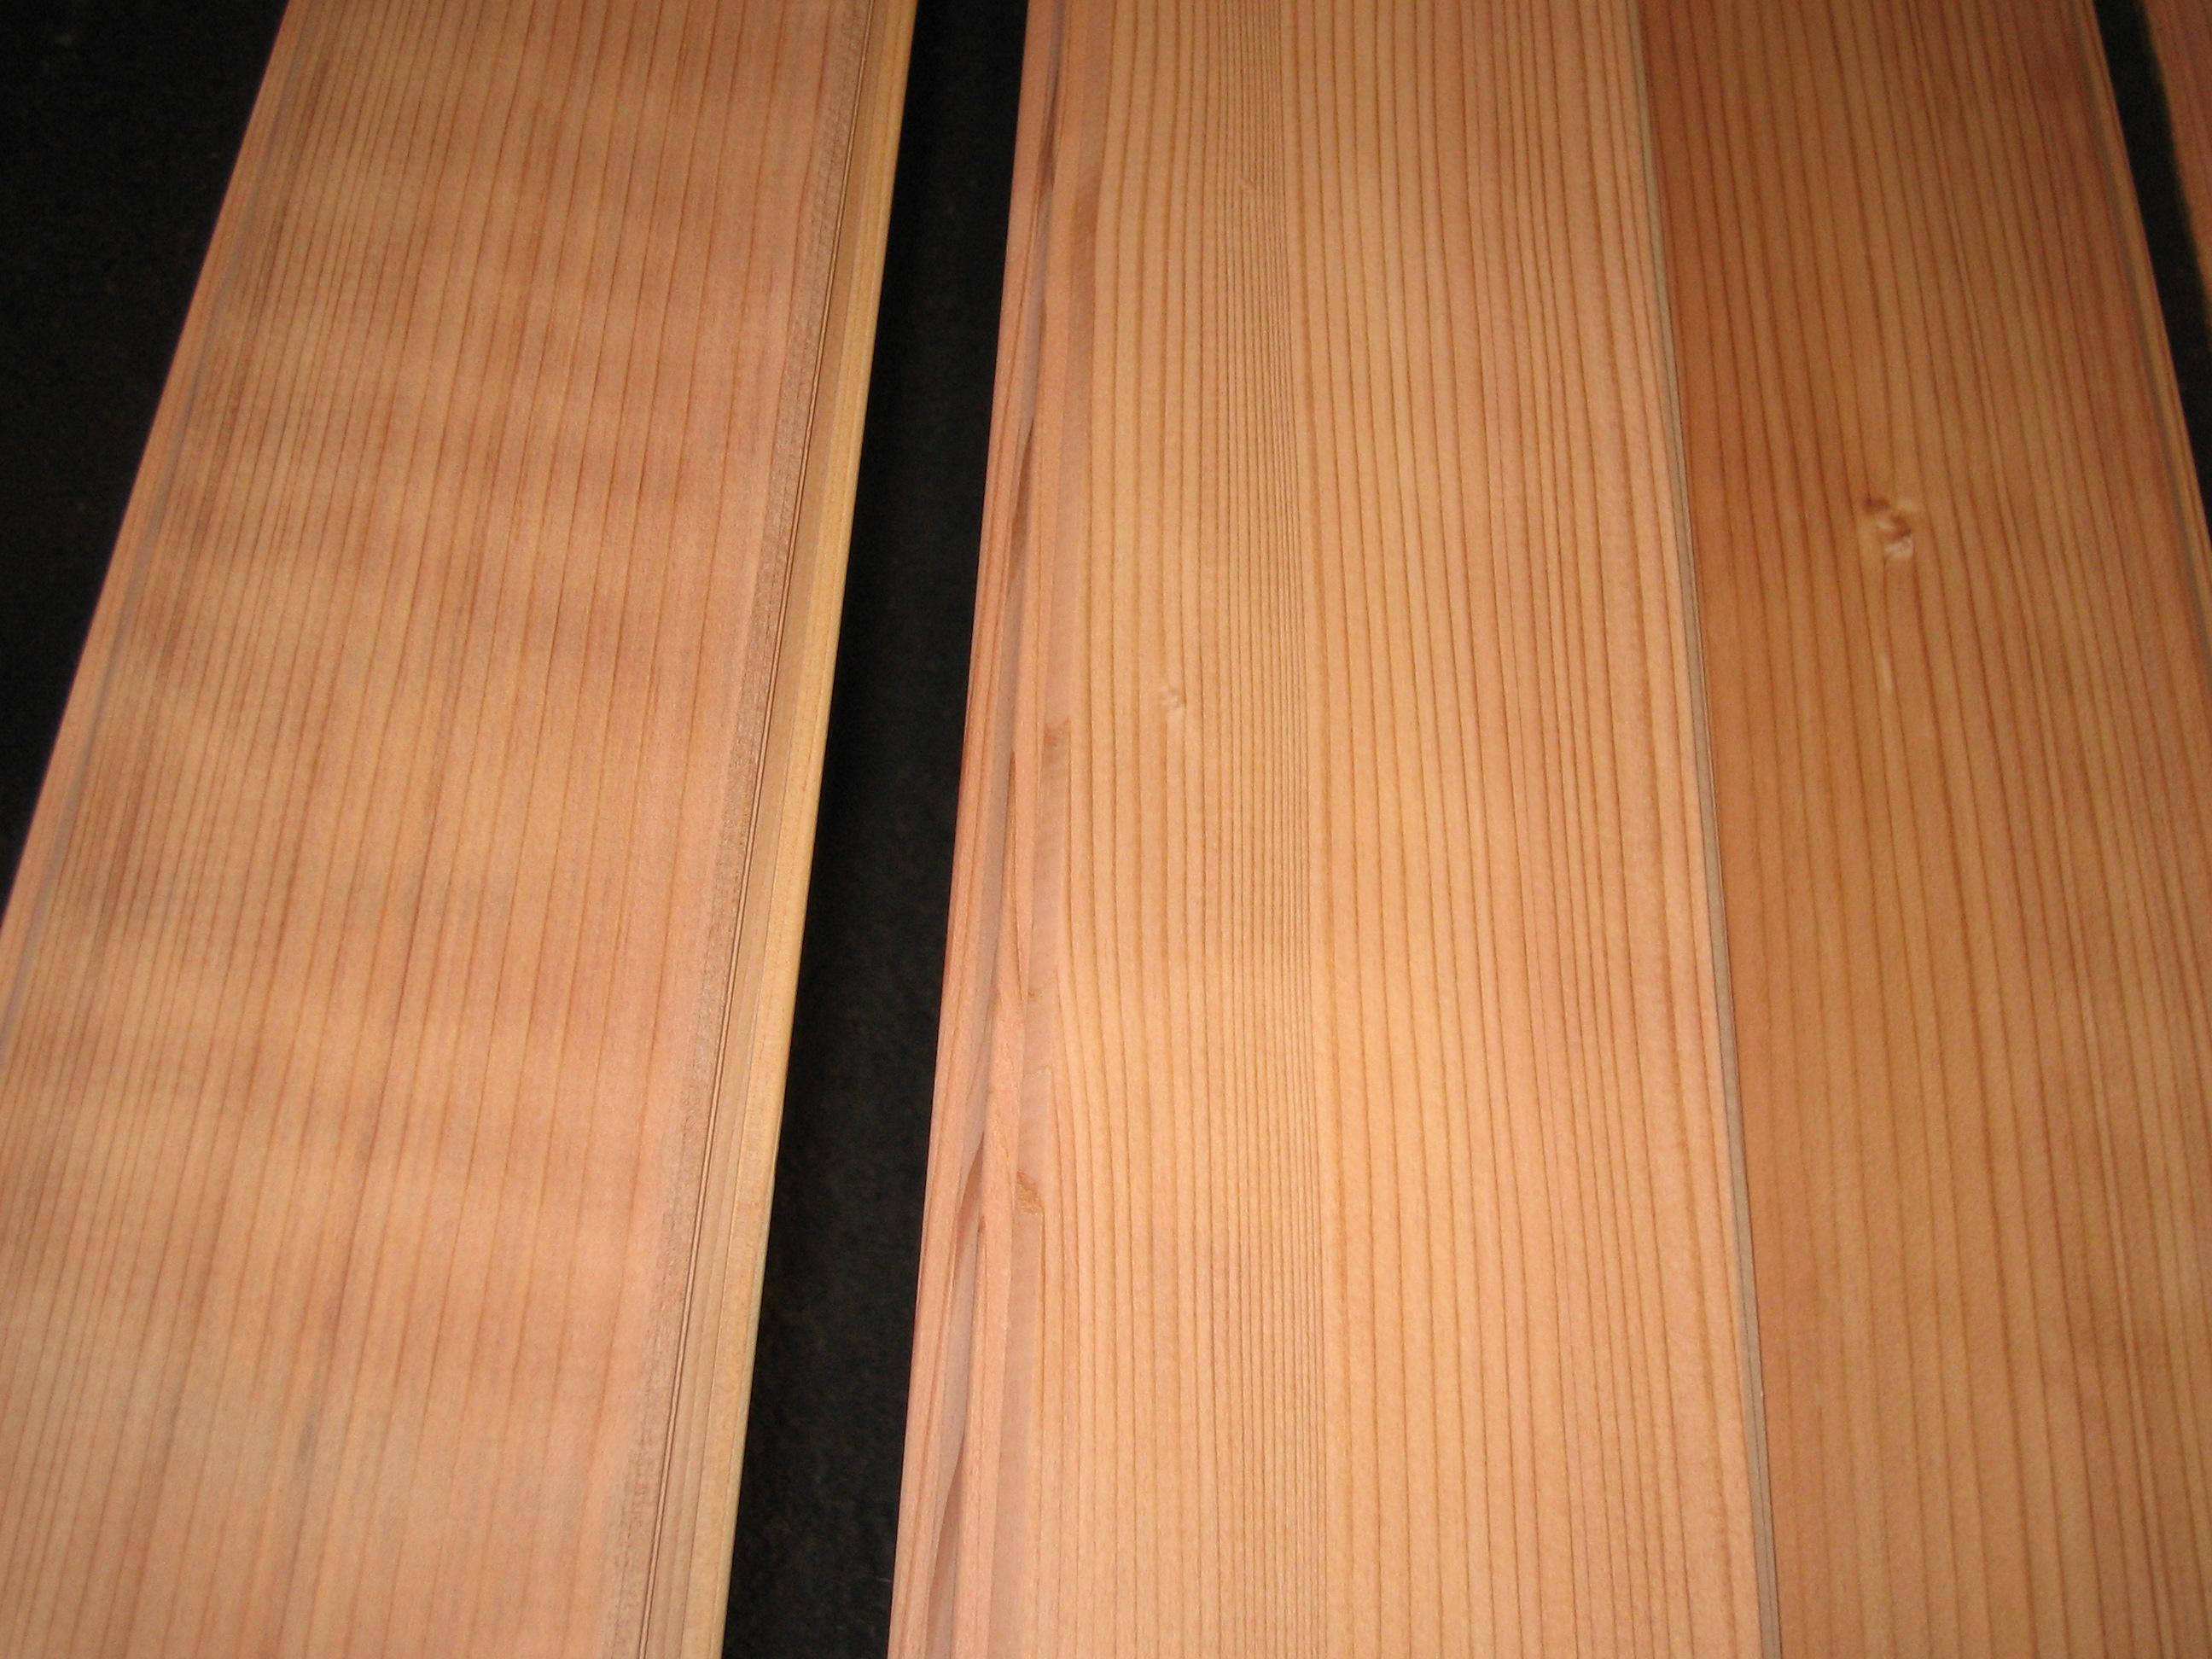 Redwood Vs Cedar >> Clear All Heart Vertical Grain California Redwood